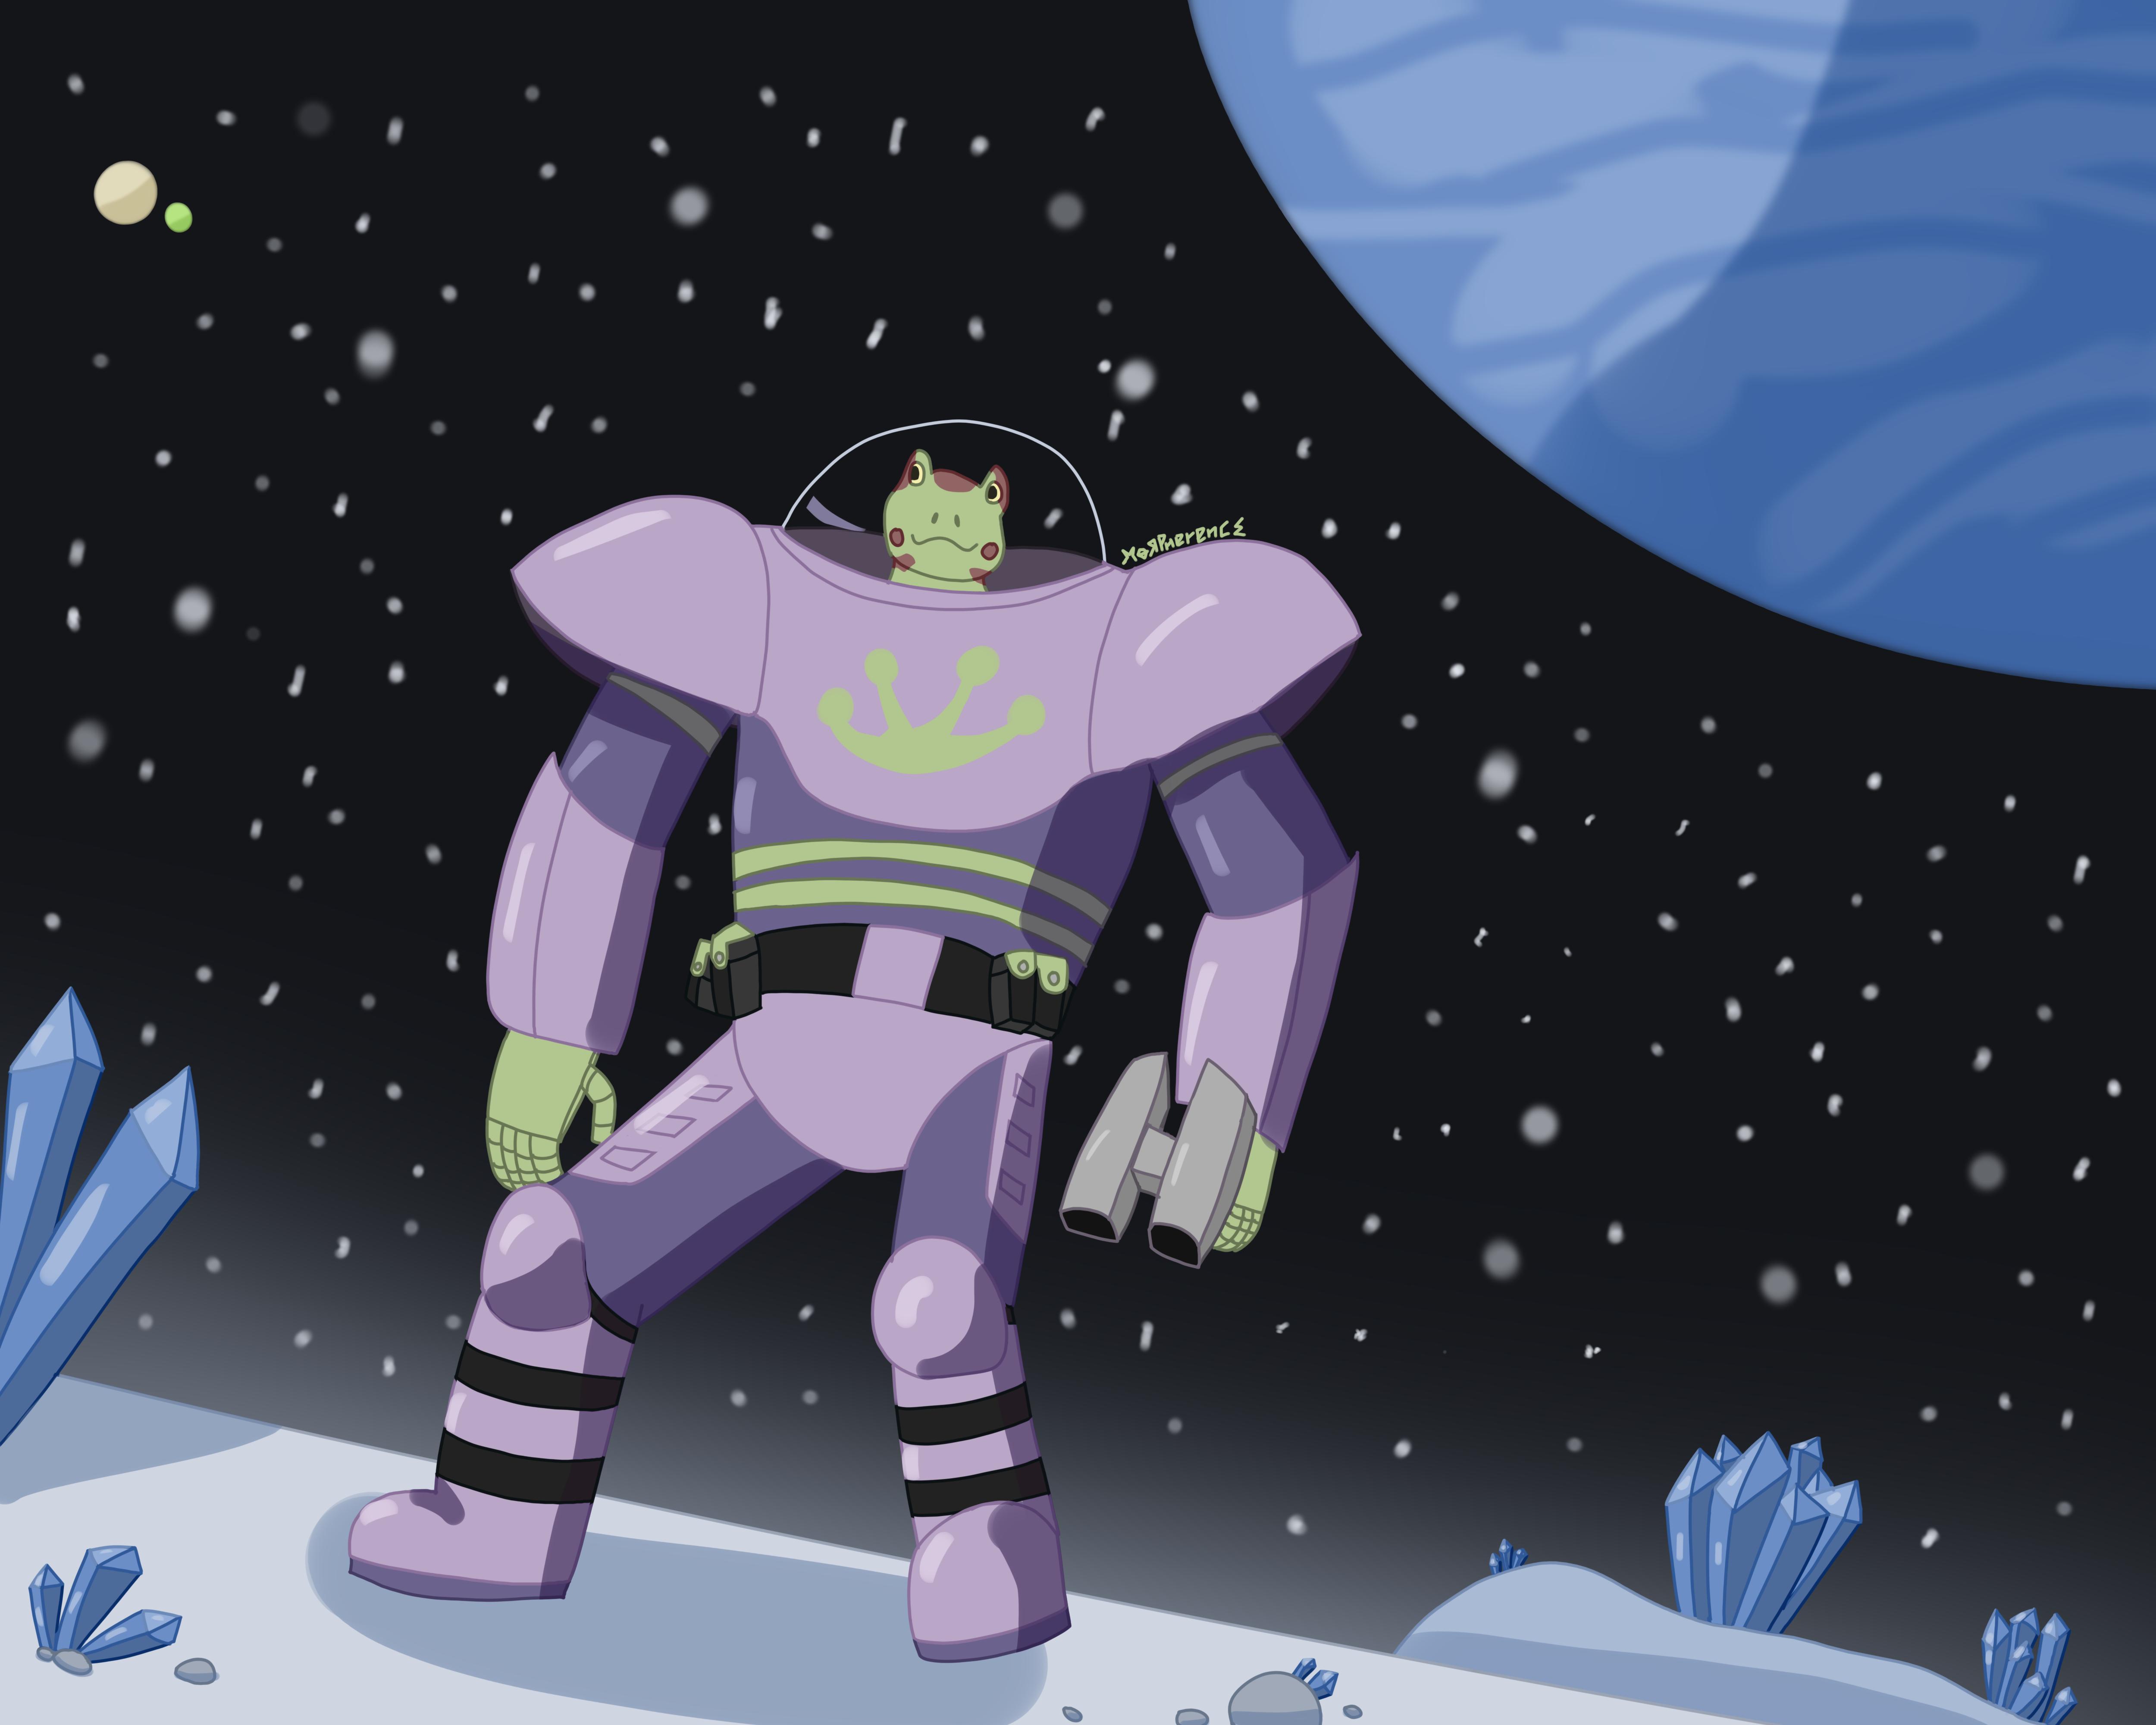 Spacefrog 13_04_2021